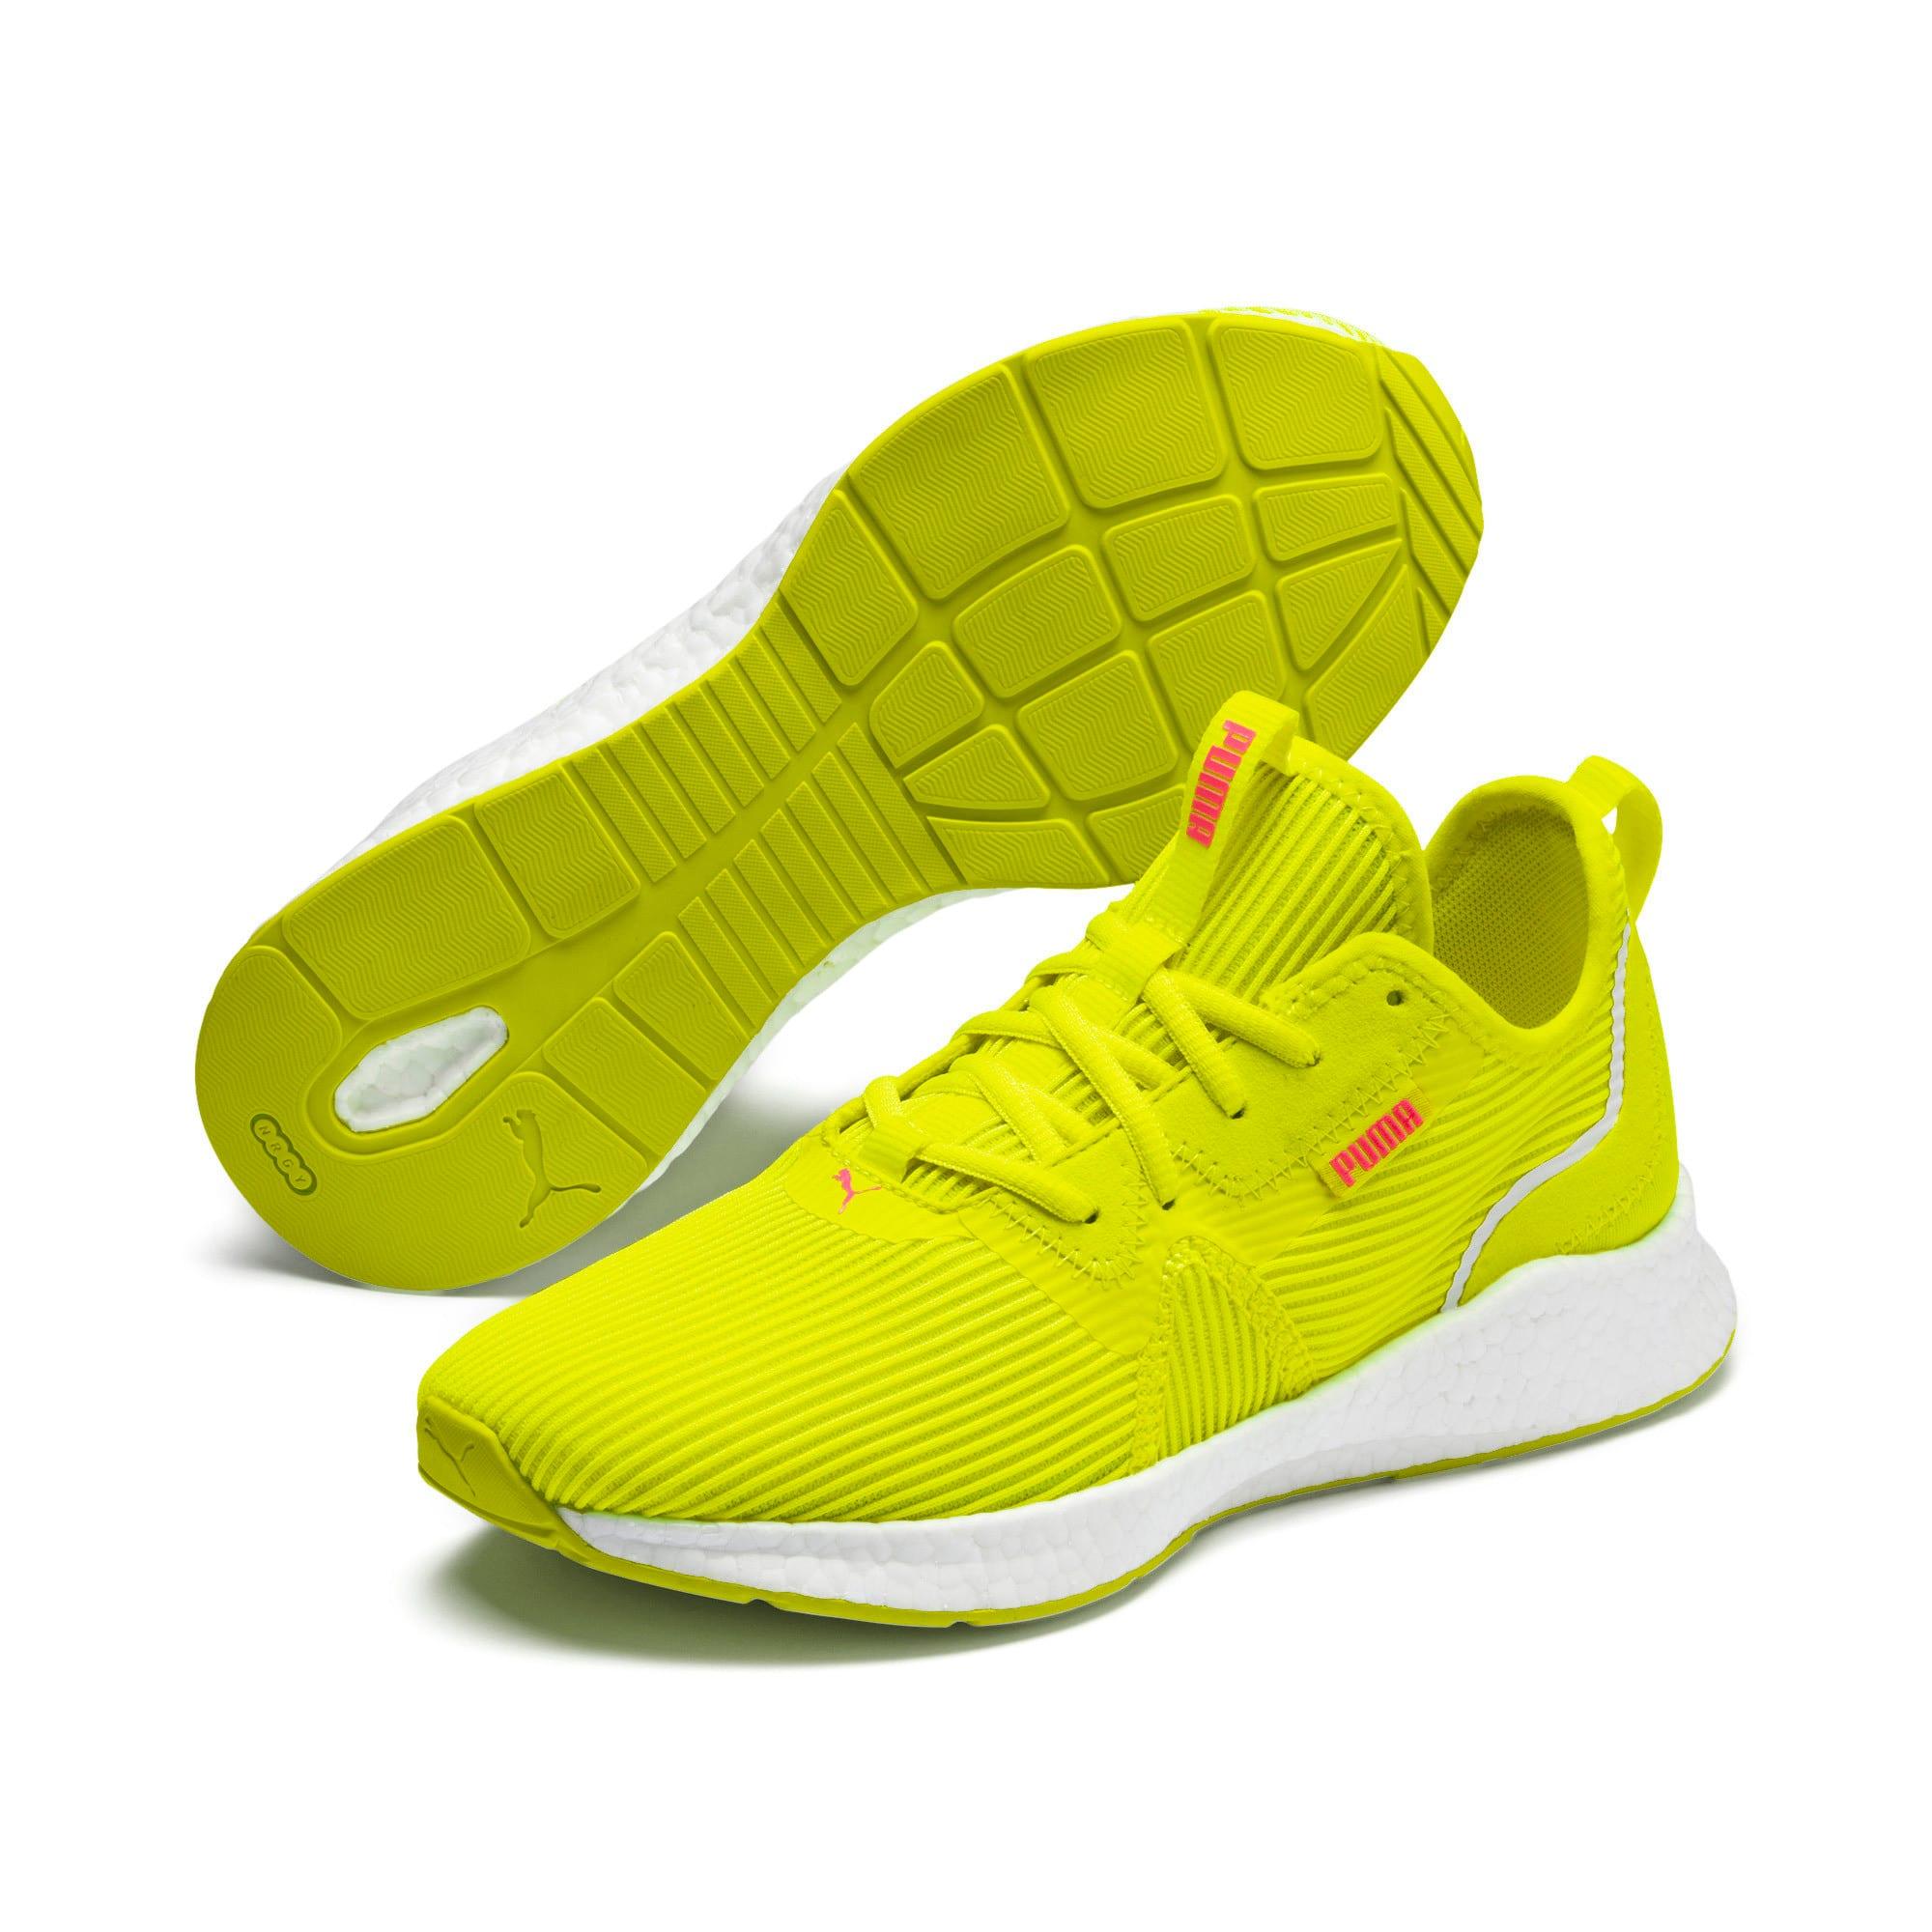 Miniatura 2 de Zapatos para correr NRGY Star Femme para mujer, Yellow Alert-Pink Alert, mediano